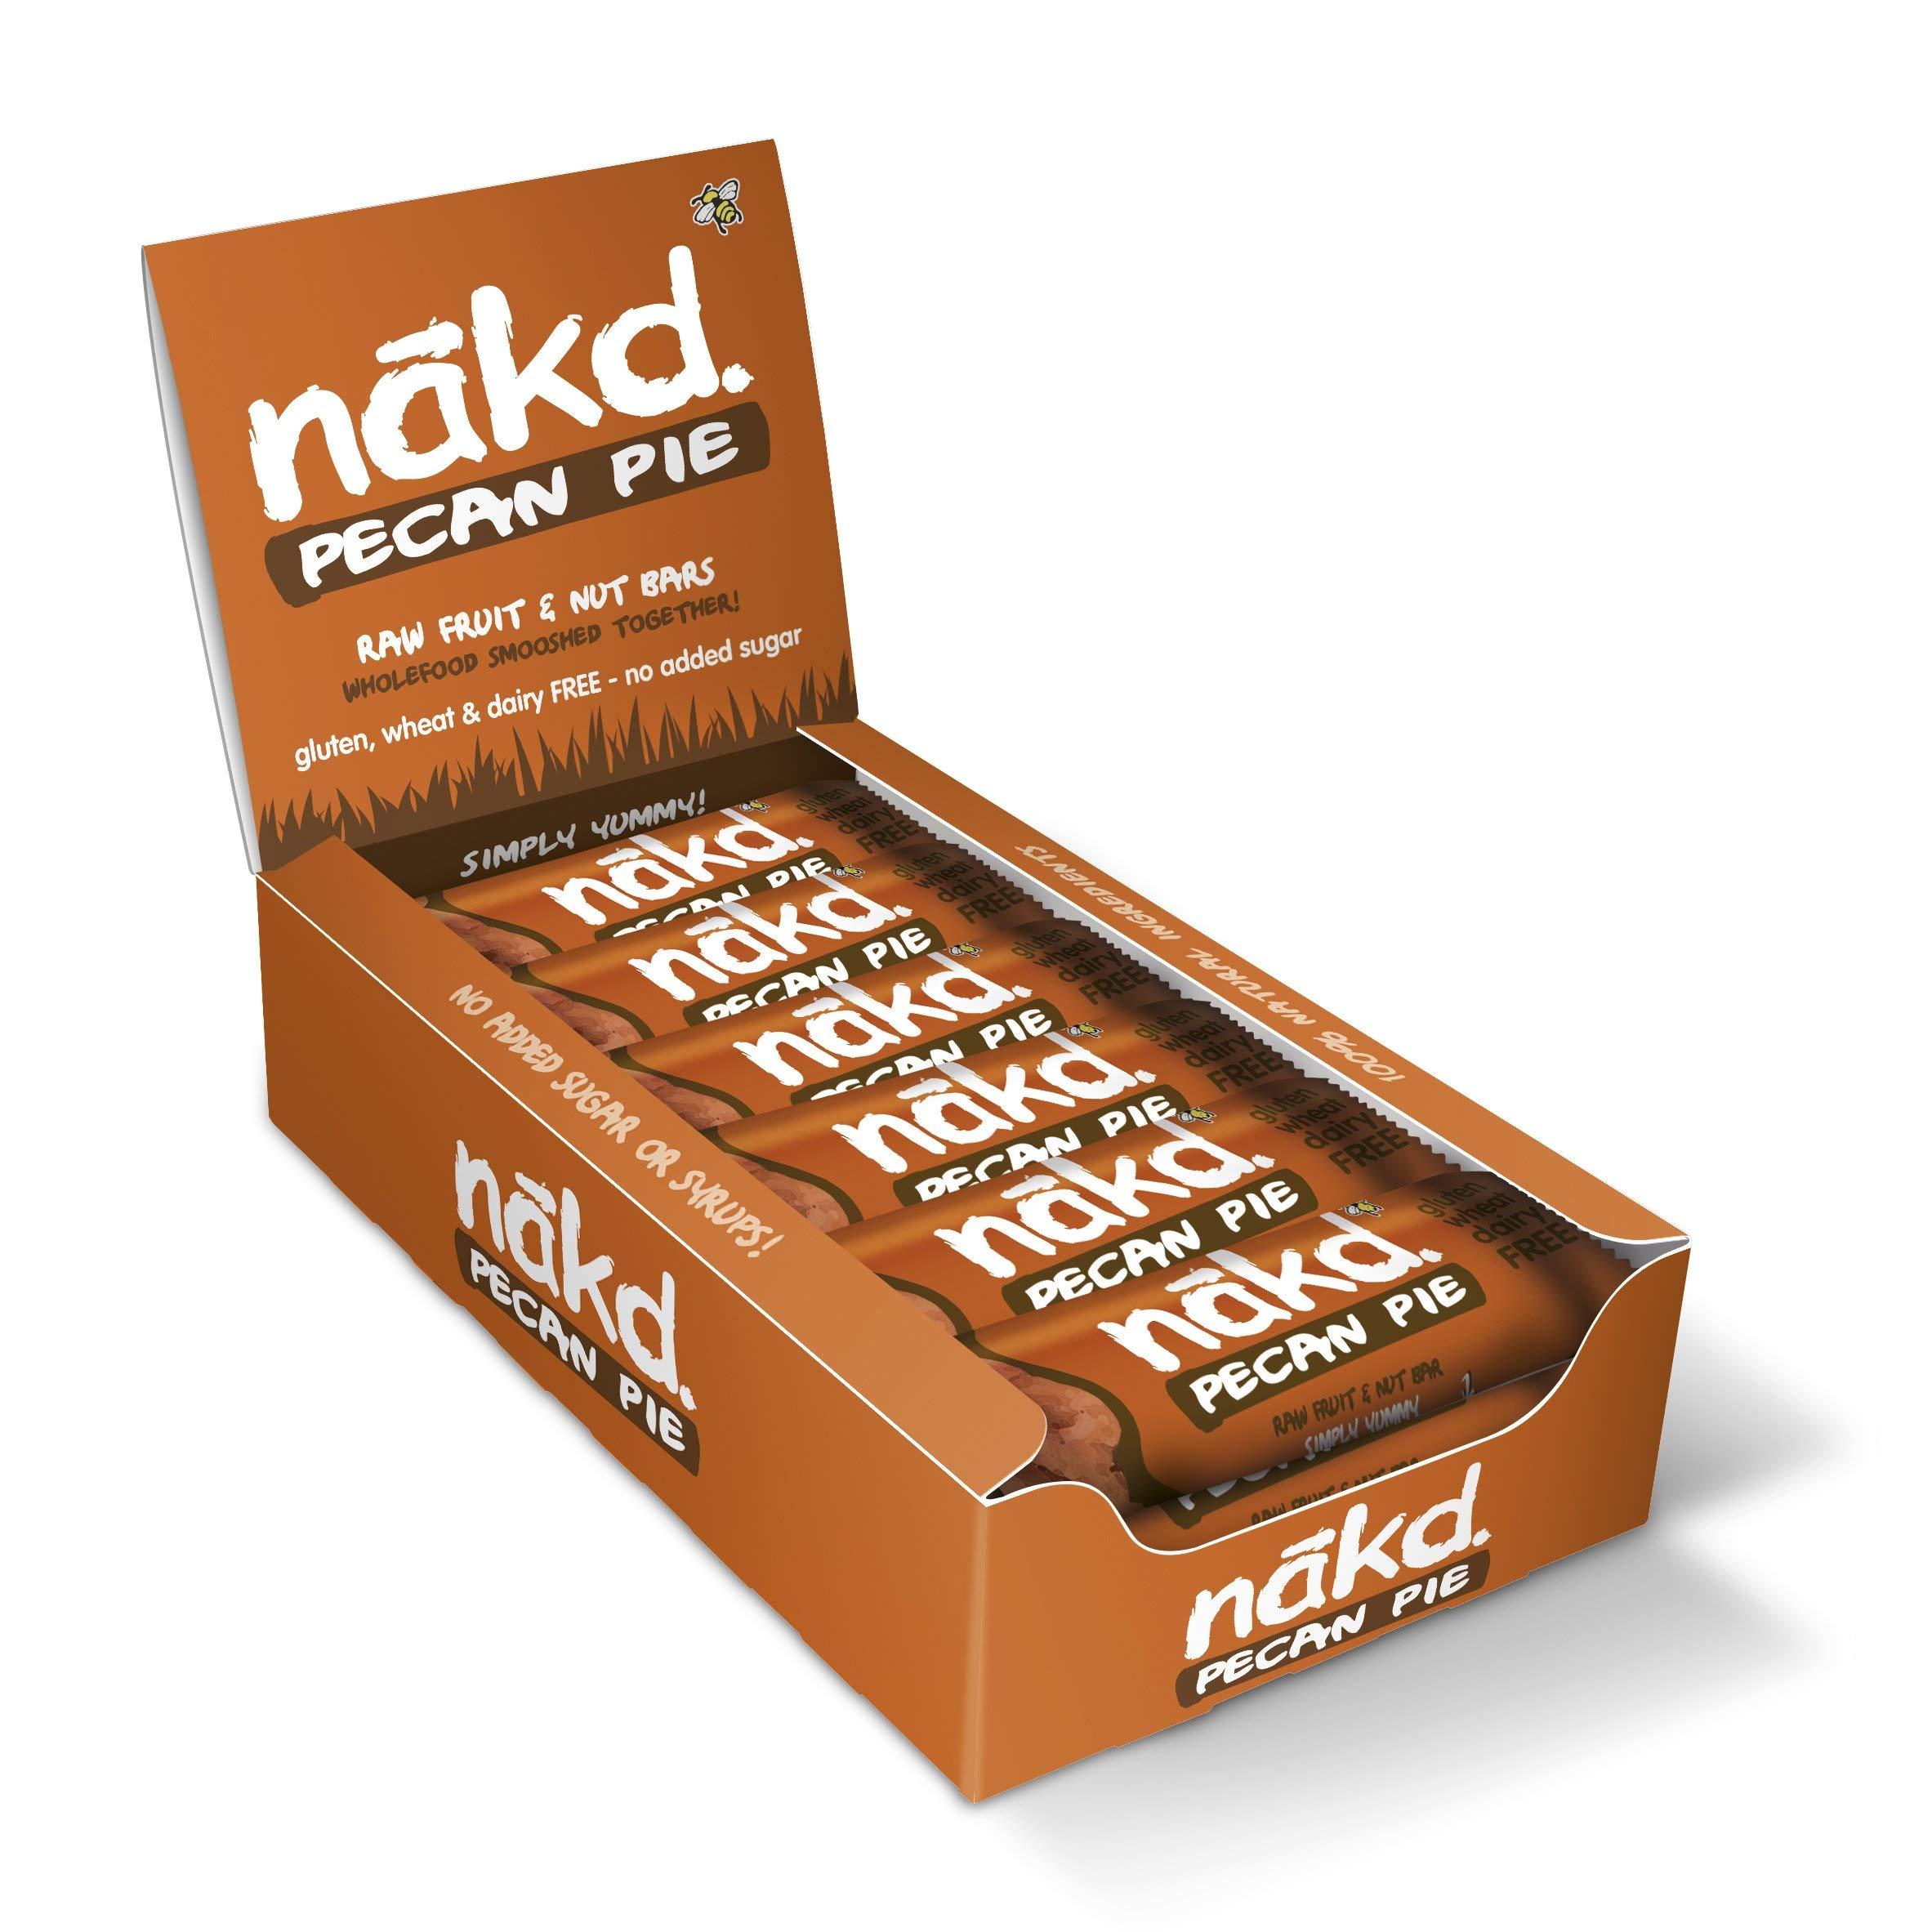 Nakd Pecan Pie Natural Fruit & Nut Bars - Vegan - Gluten Free - Healthy Snack, 35 g (Pack of 18)